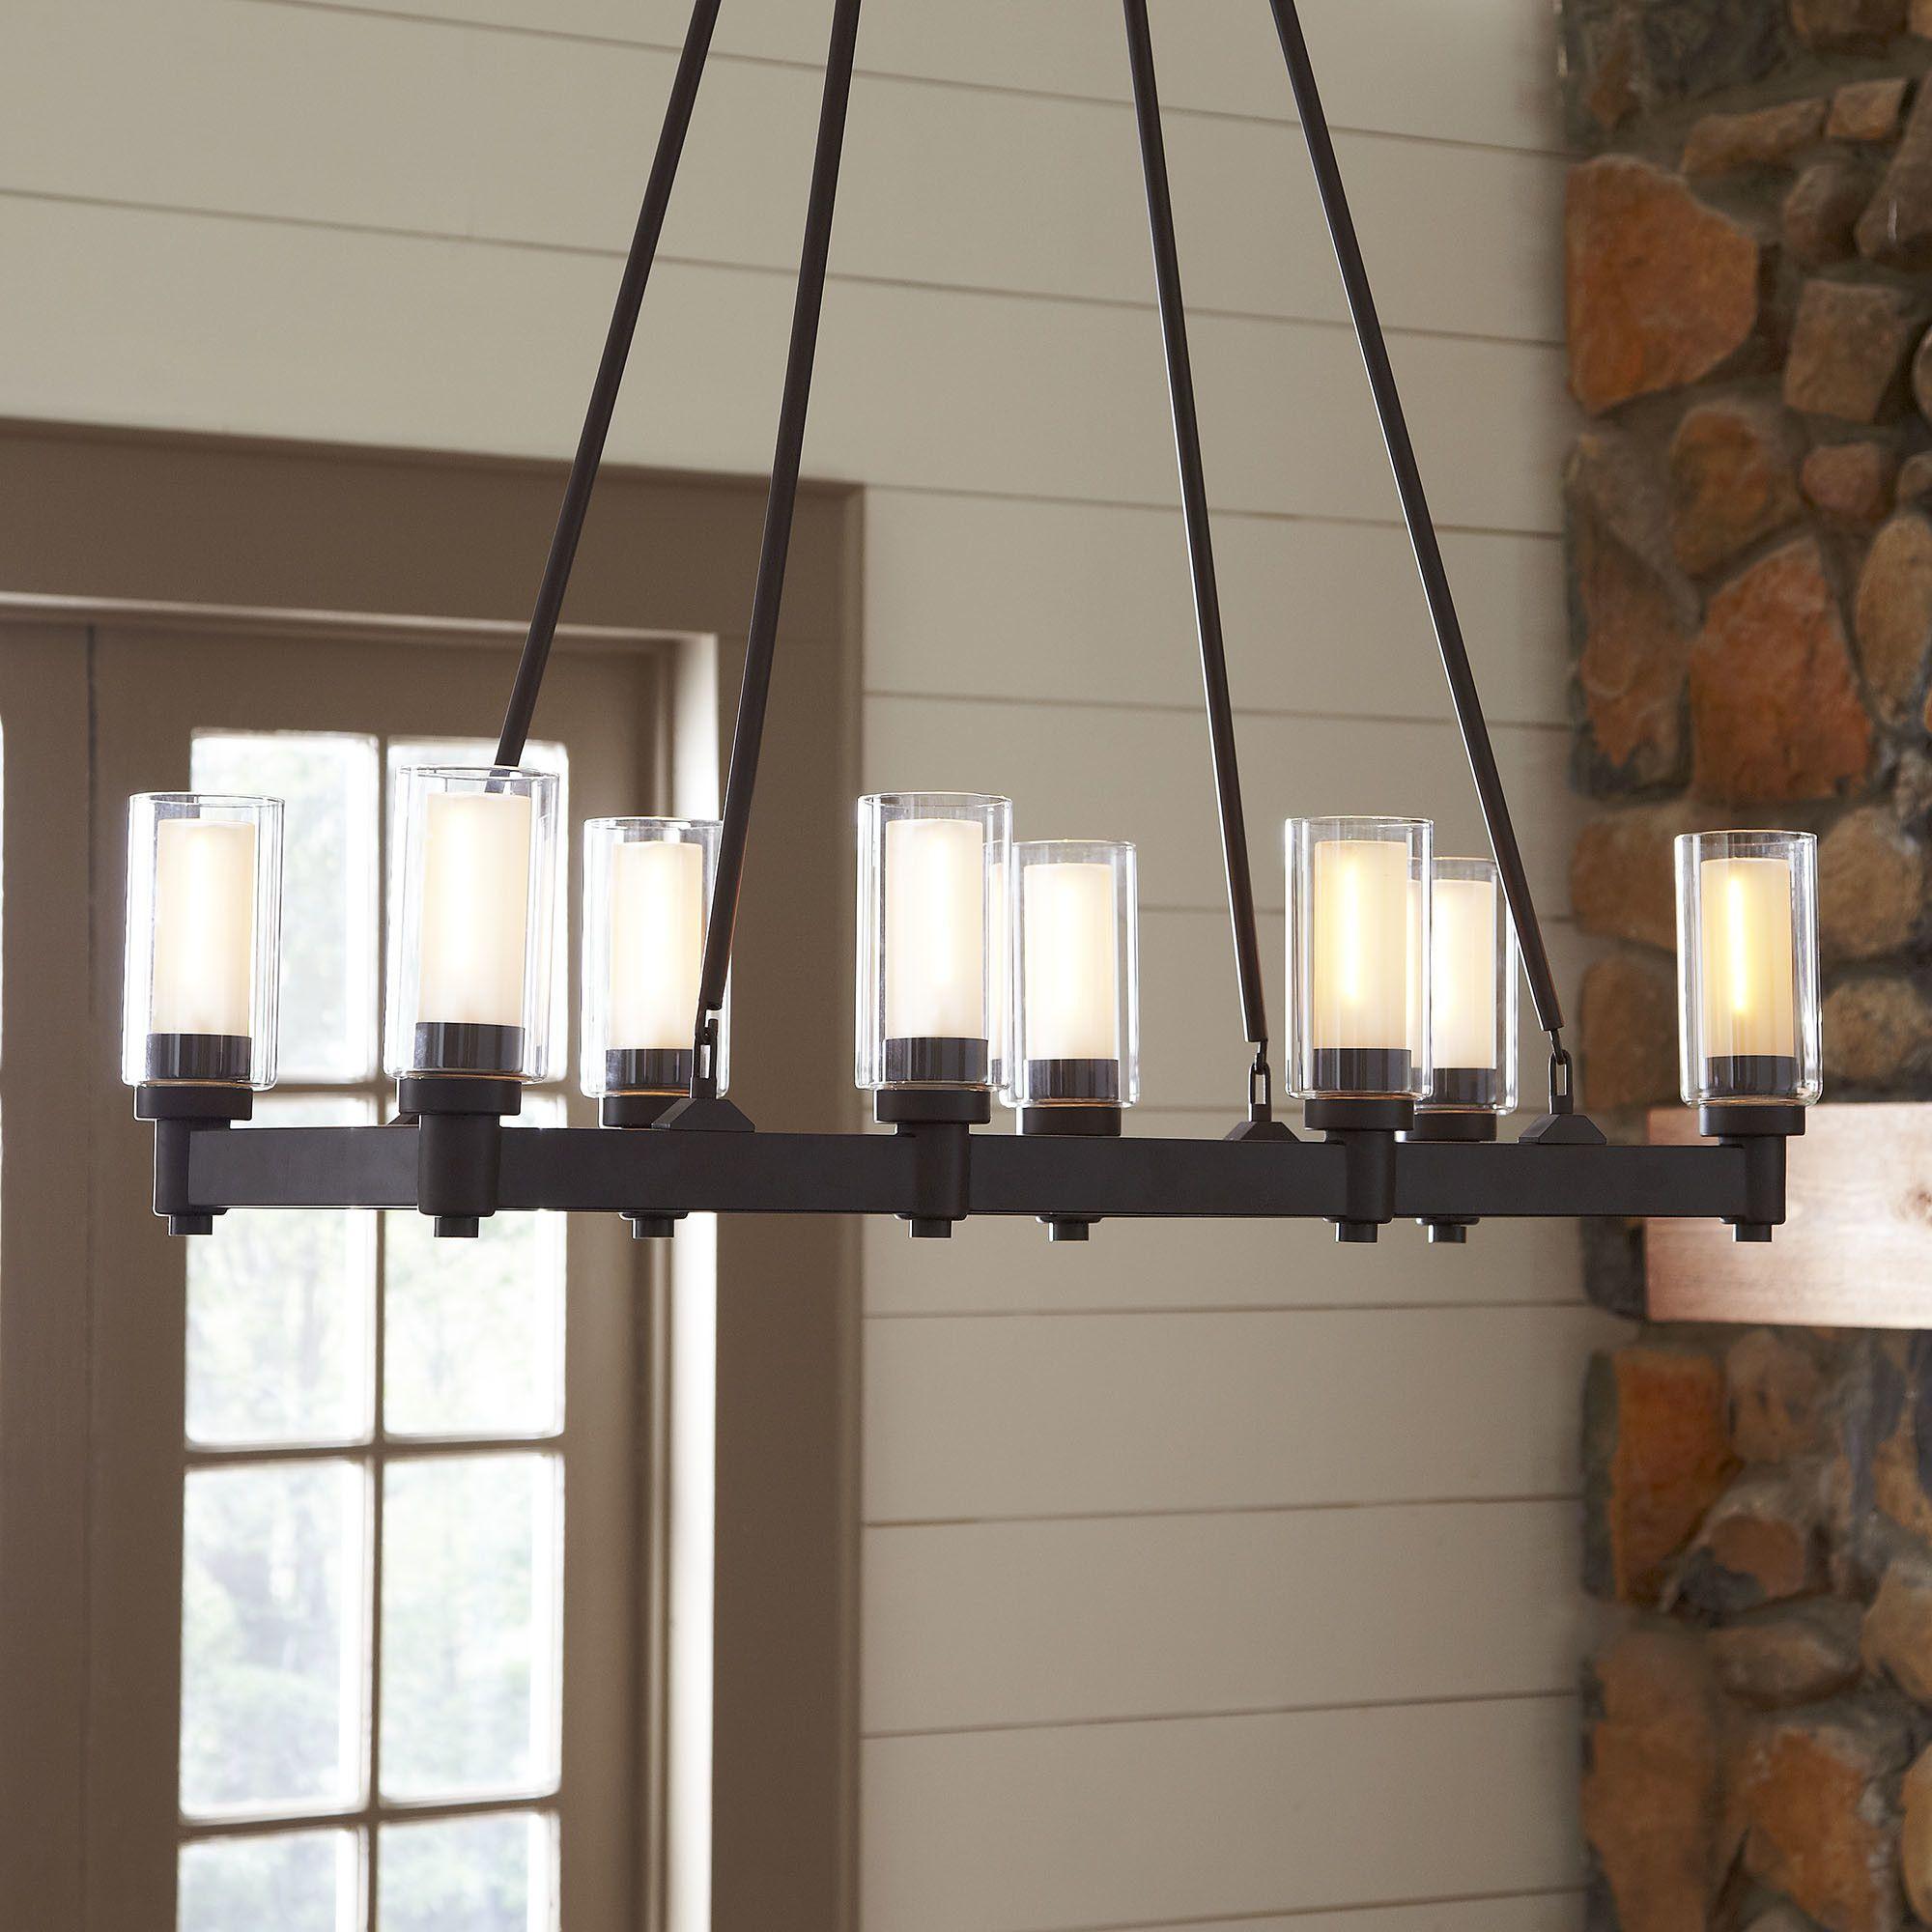 rectangular kitchen island modern fixtures arturo magnificent light chandeliers lighting pendant chandelier design stunning